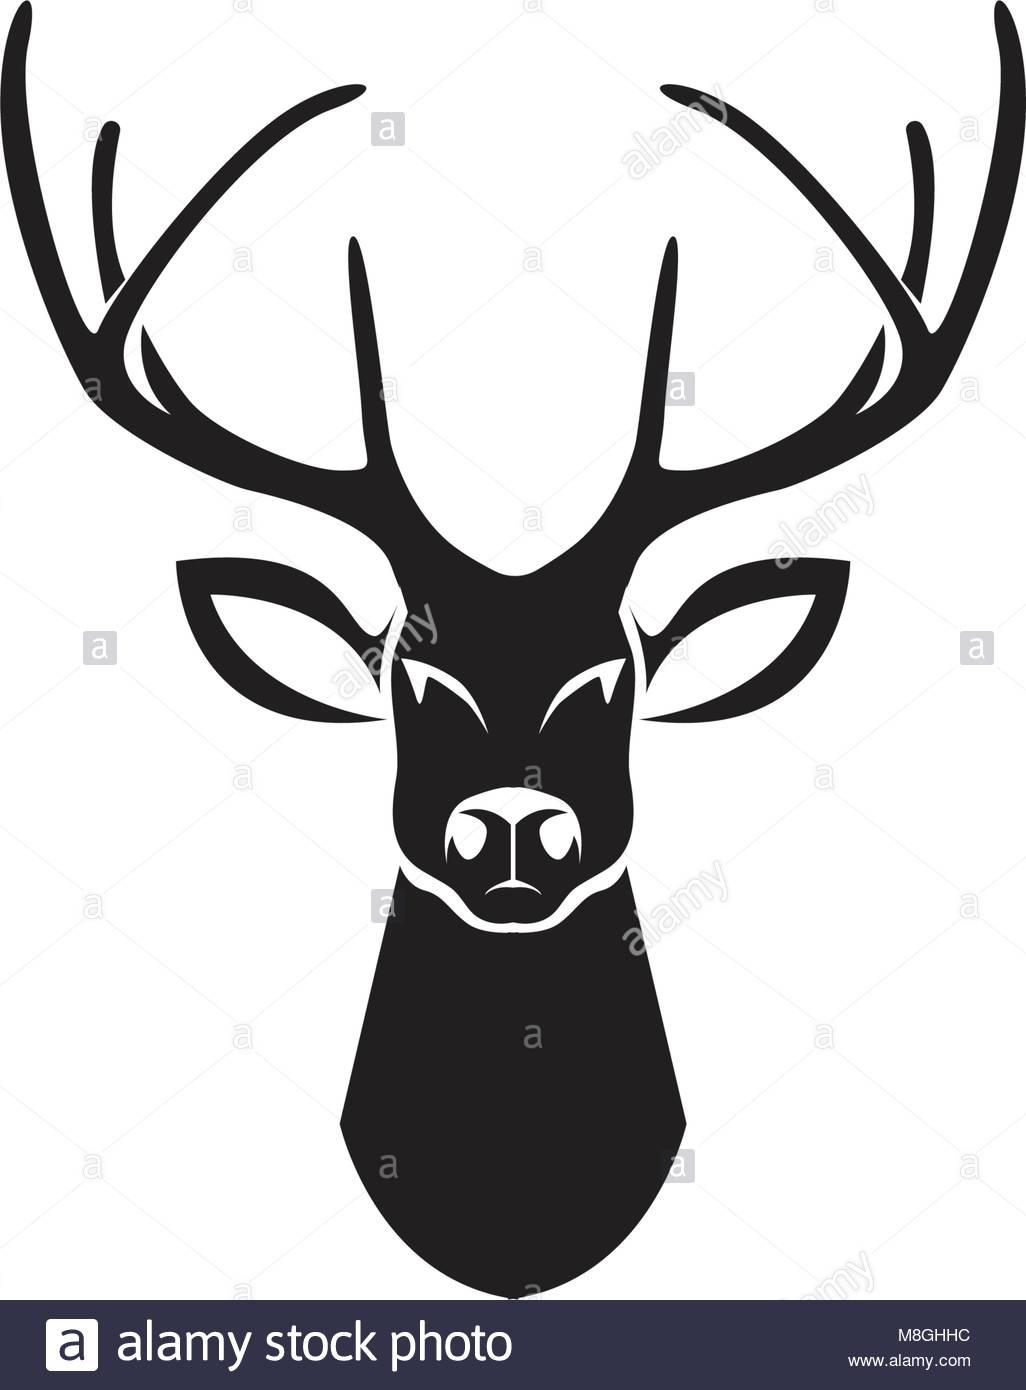 head deer animals logo black silhouete icons stock vector art rh alamy com deer head logo for women's winter jackets browning deer head logo